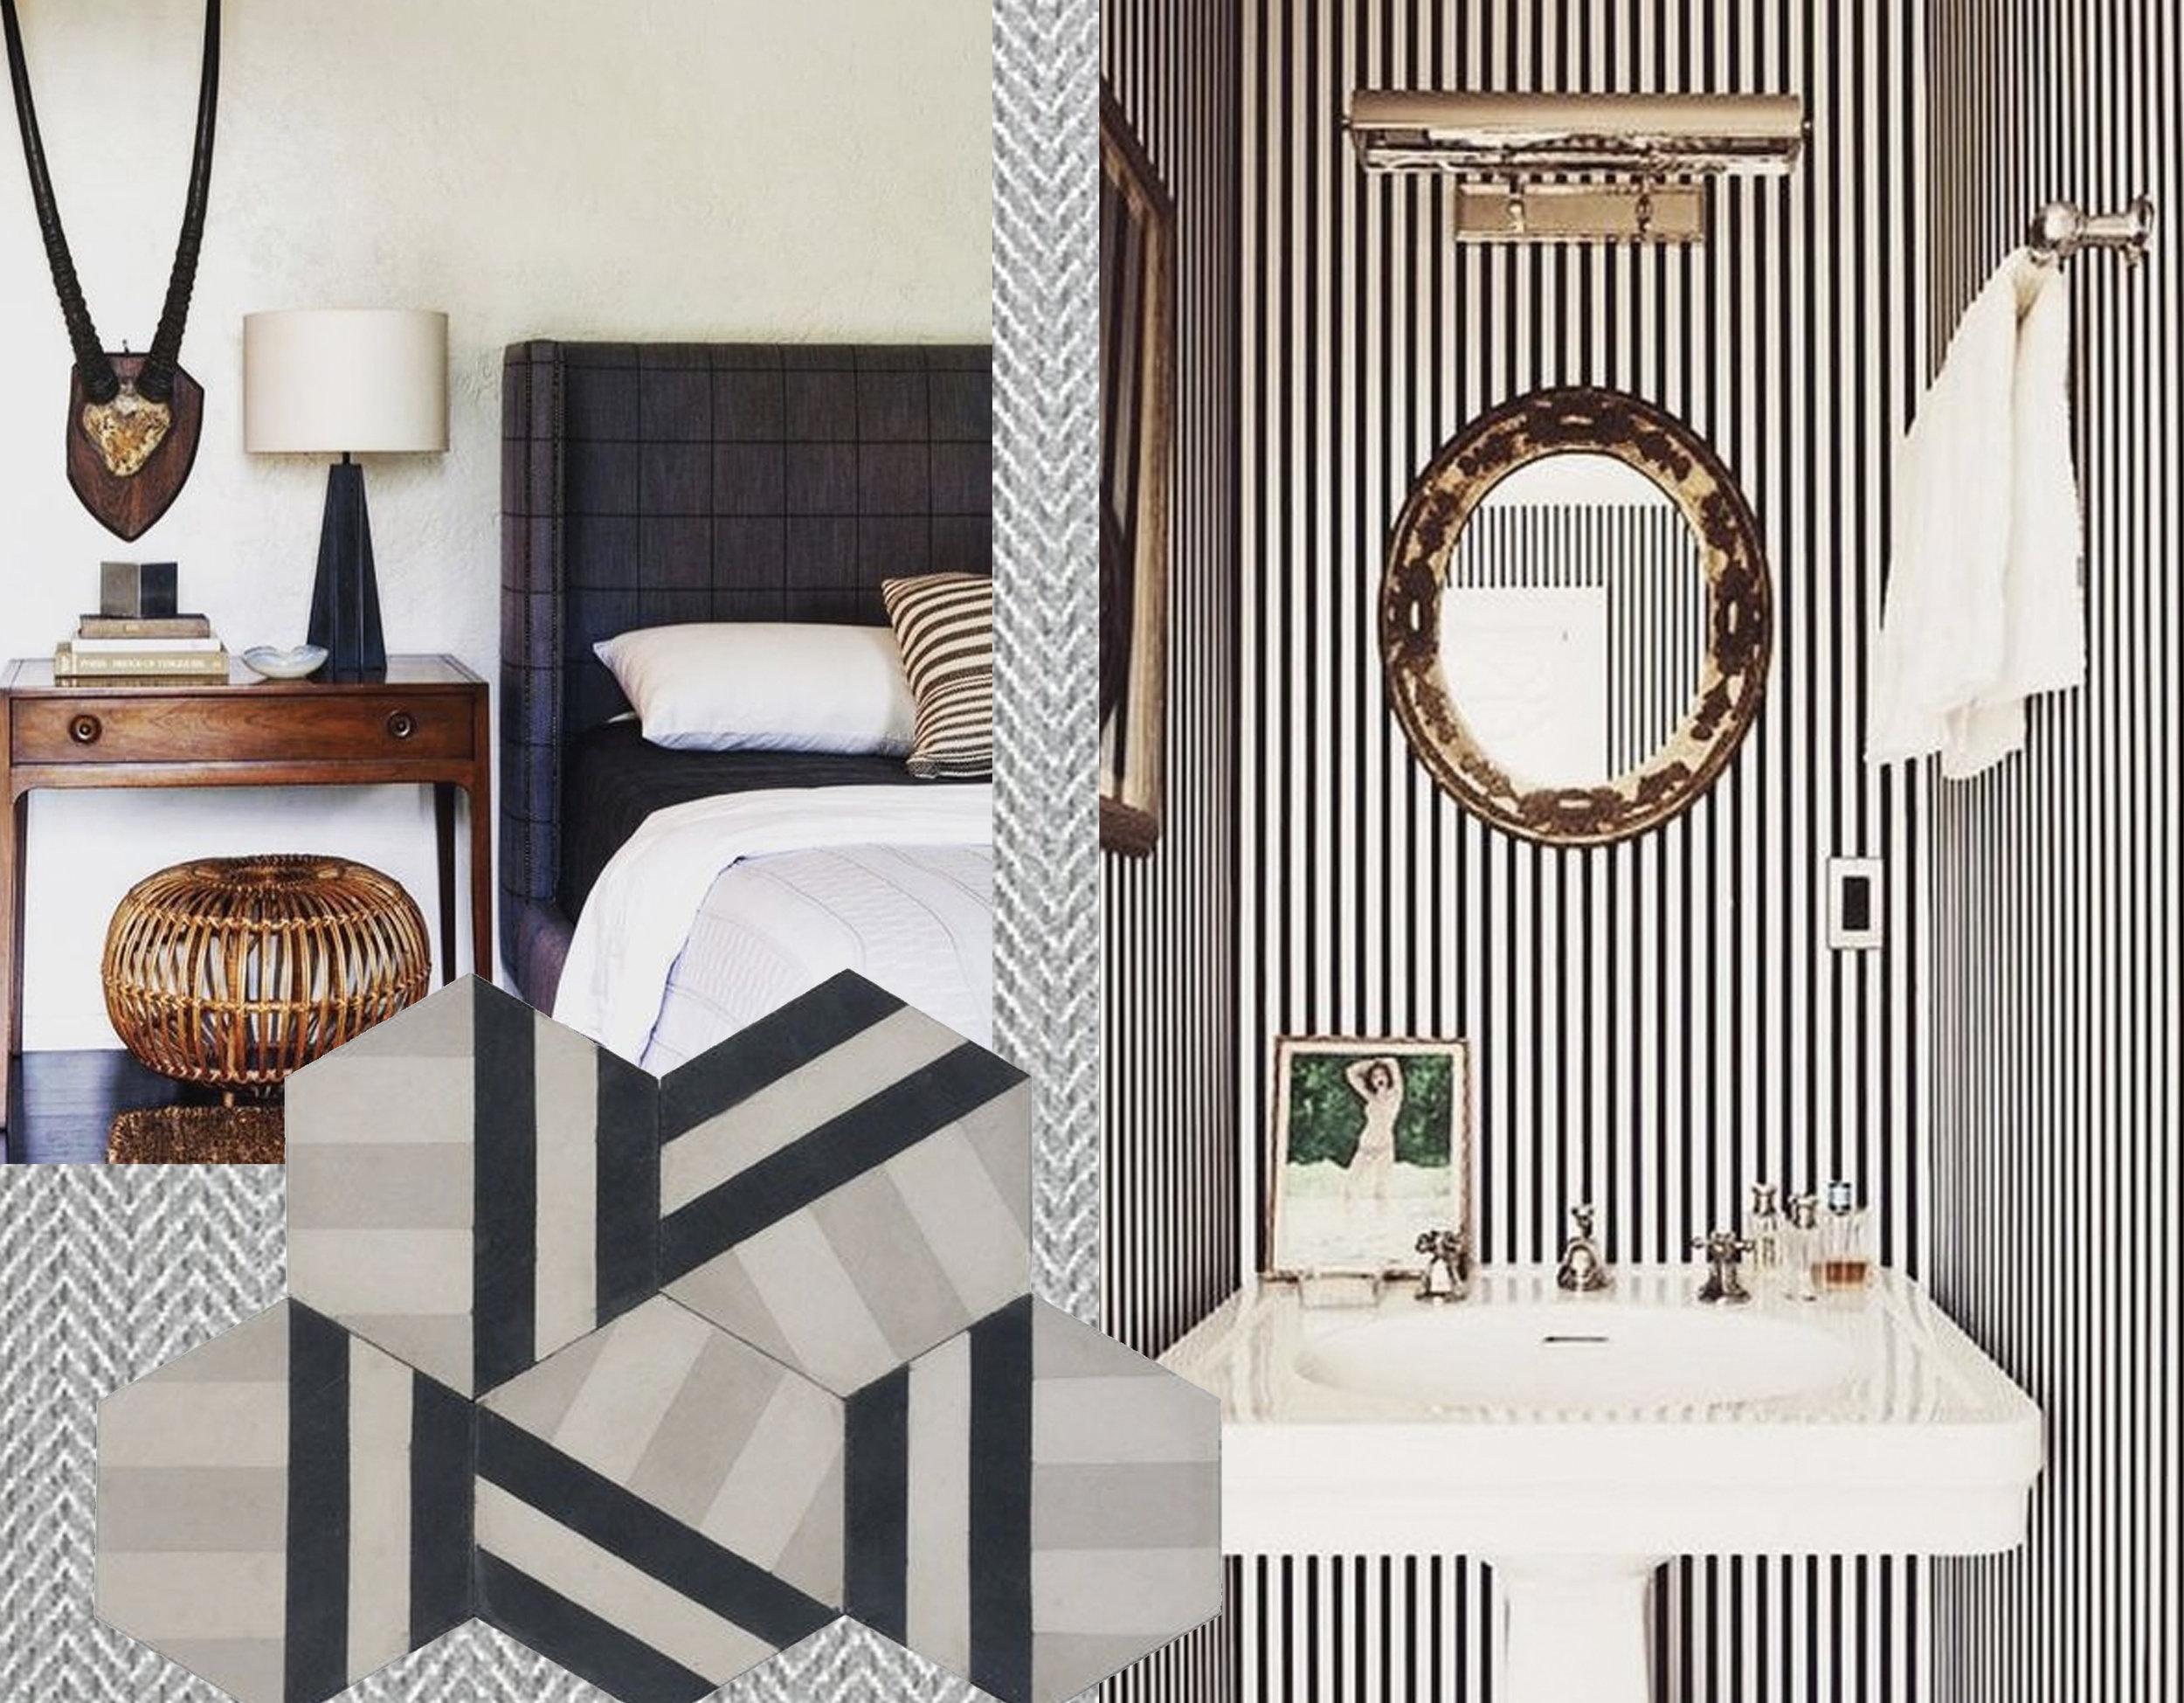 Catalina herringbone fabric  Thibaut - bedroom image via  Digs Digs  - cement tiles  Cement Tiles Shop  - bathroom image